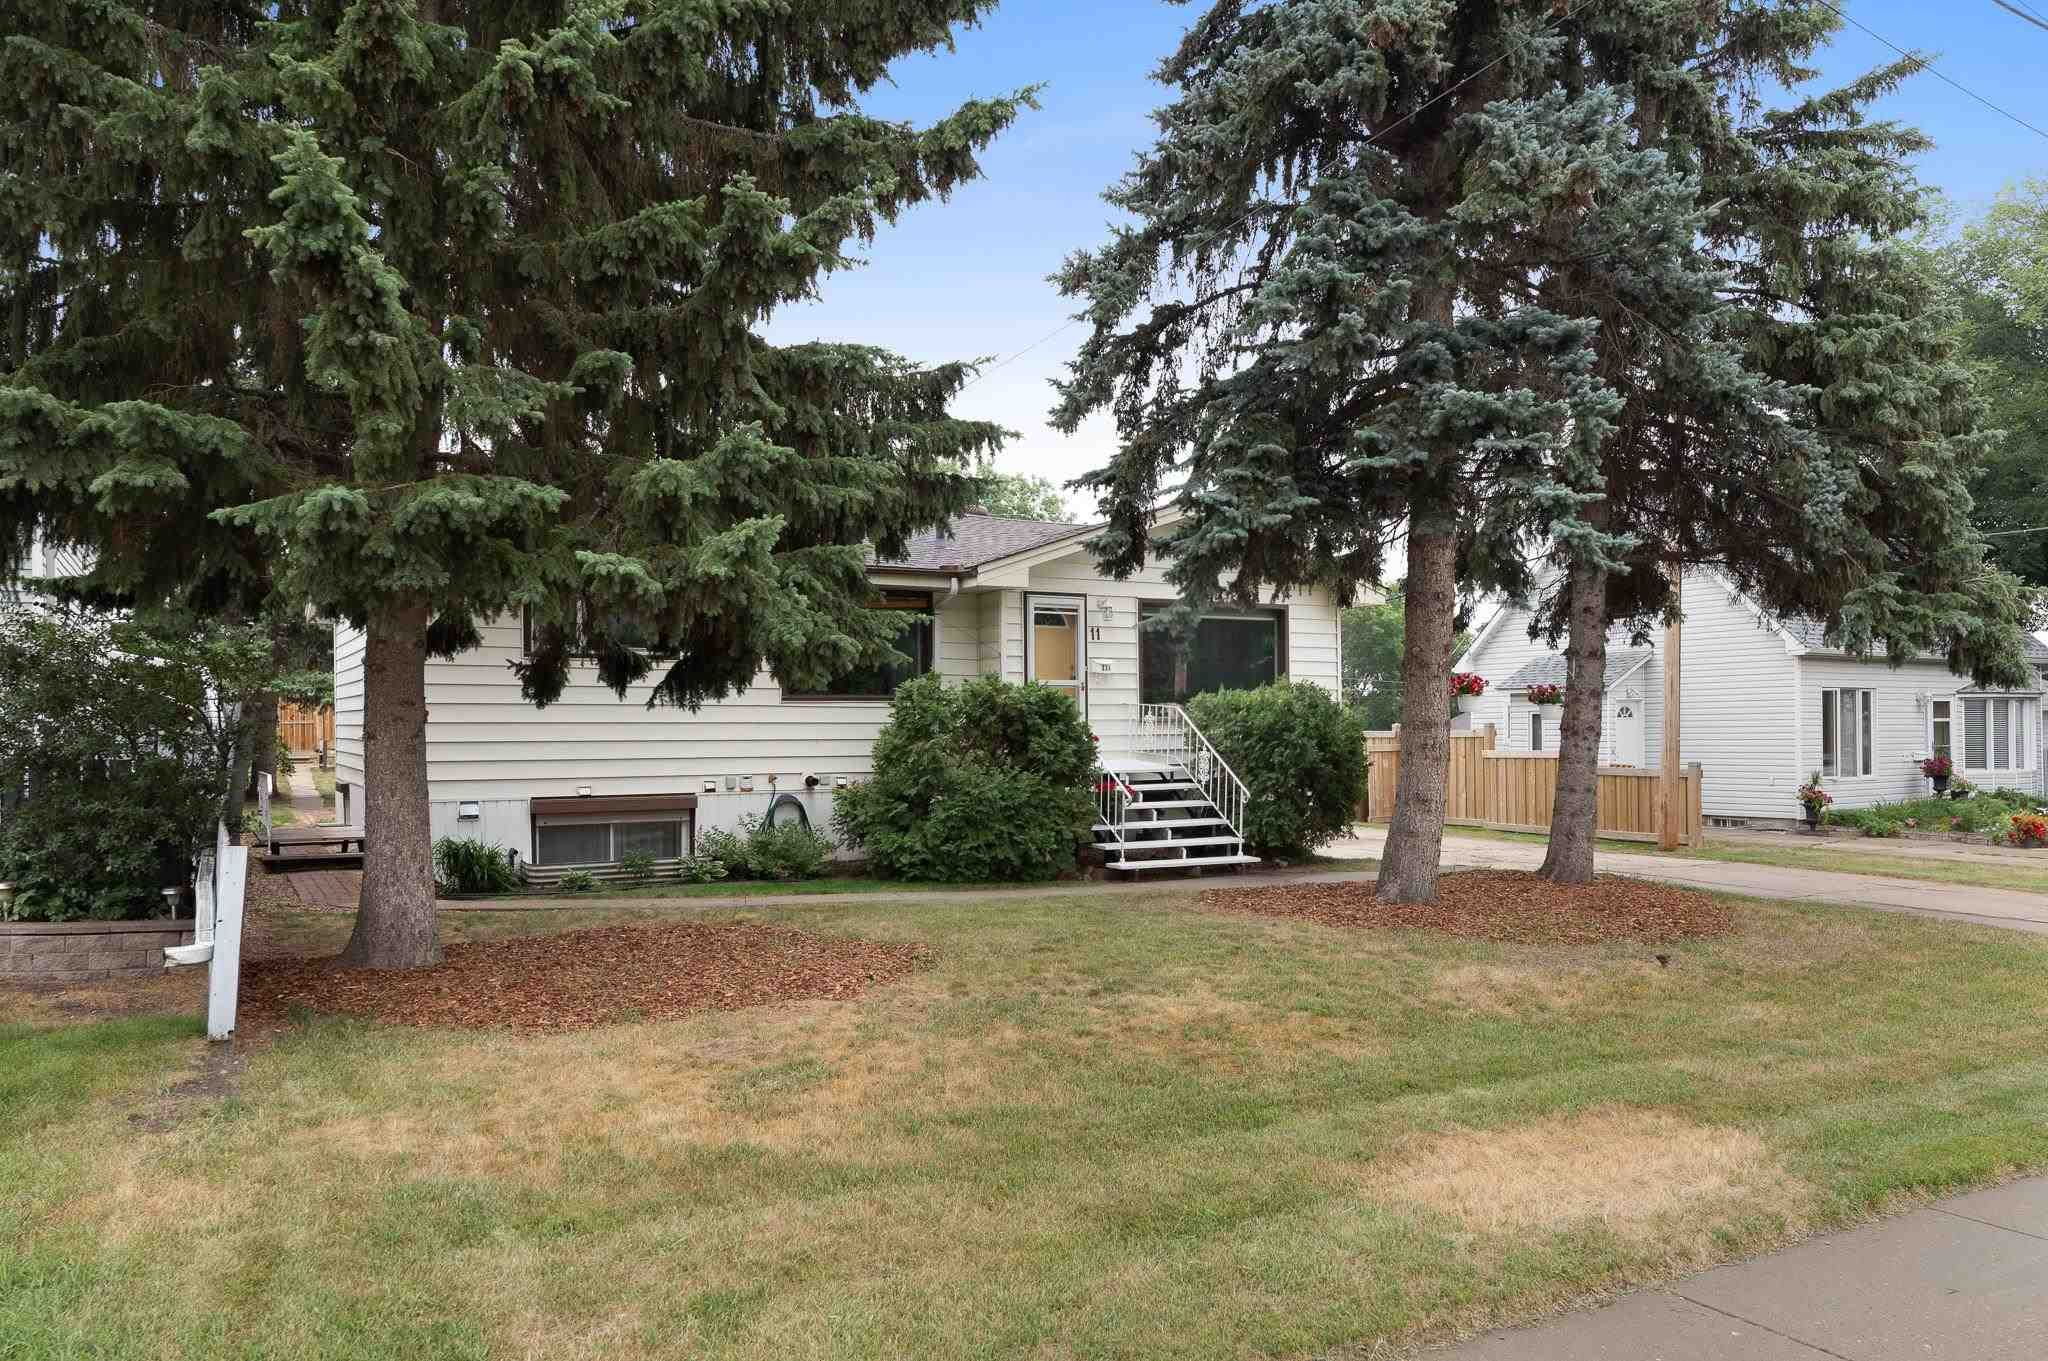 Main Photo: 11 MOUNT ROYAL Drive: St. Albert House for sale : MLS®# E4266102